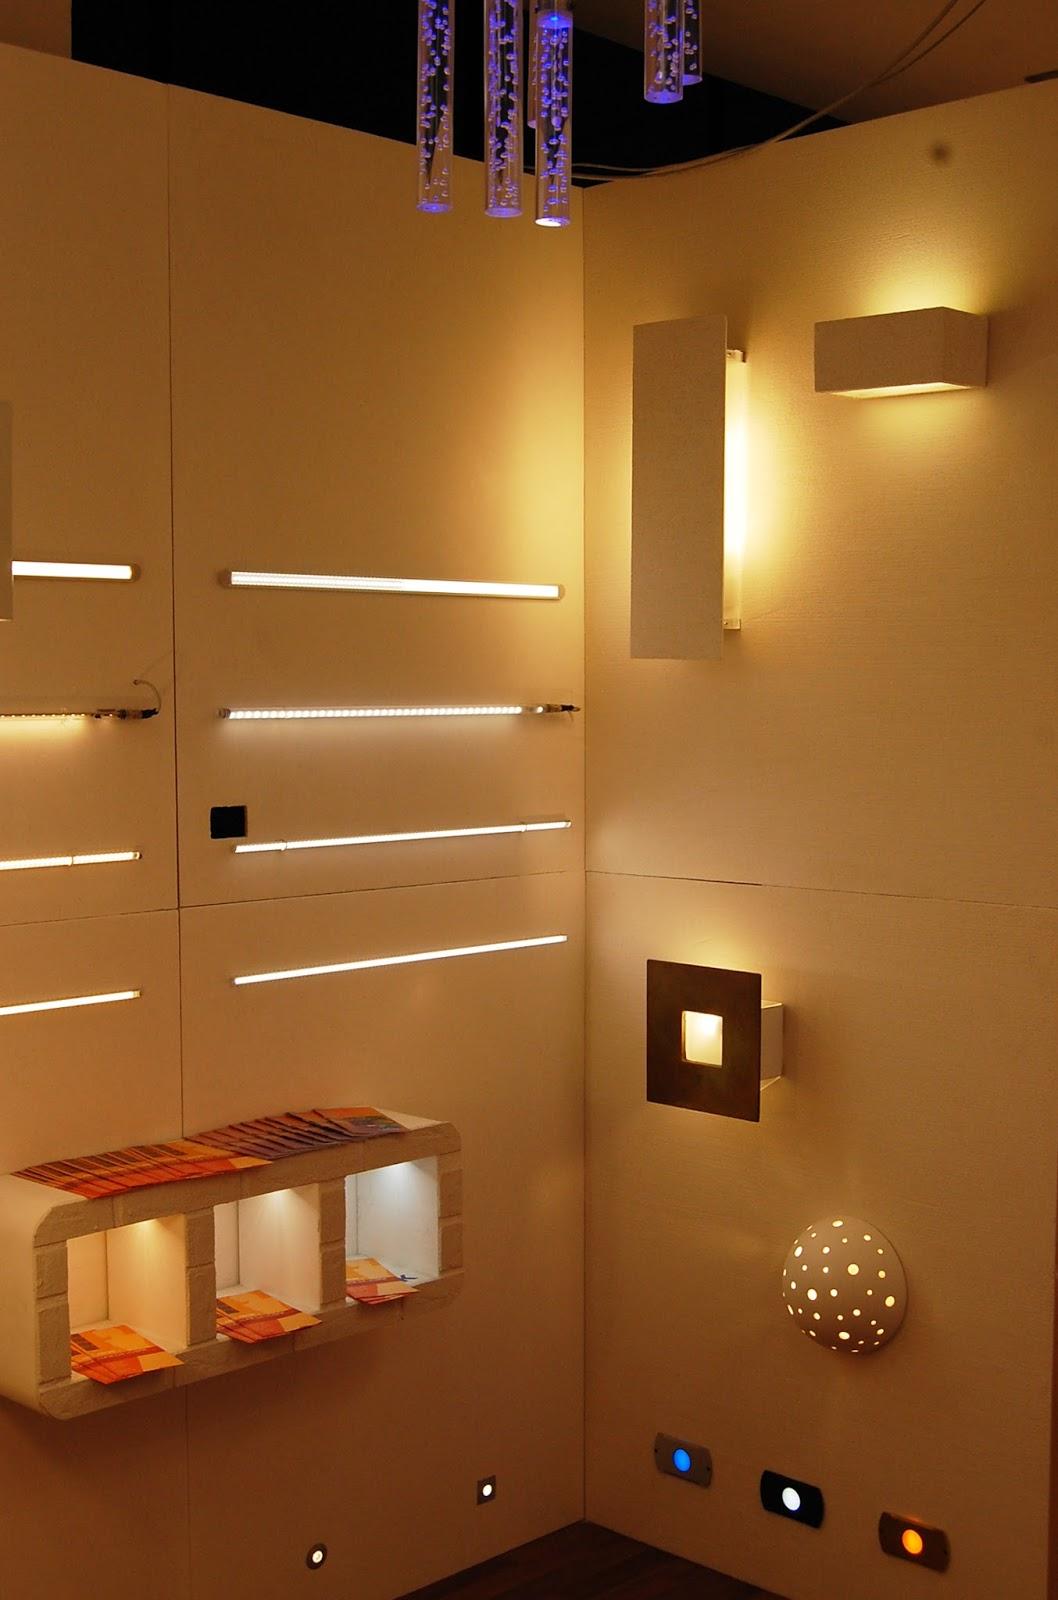 Illuminazione Travi A Vista, Illuminazione Scale, Illuminazione Milano Negozi, Illuminazione ...